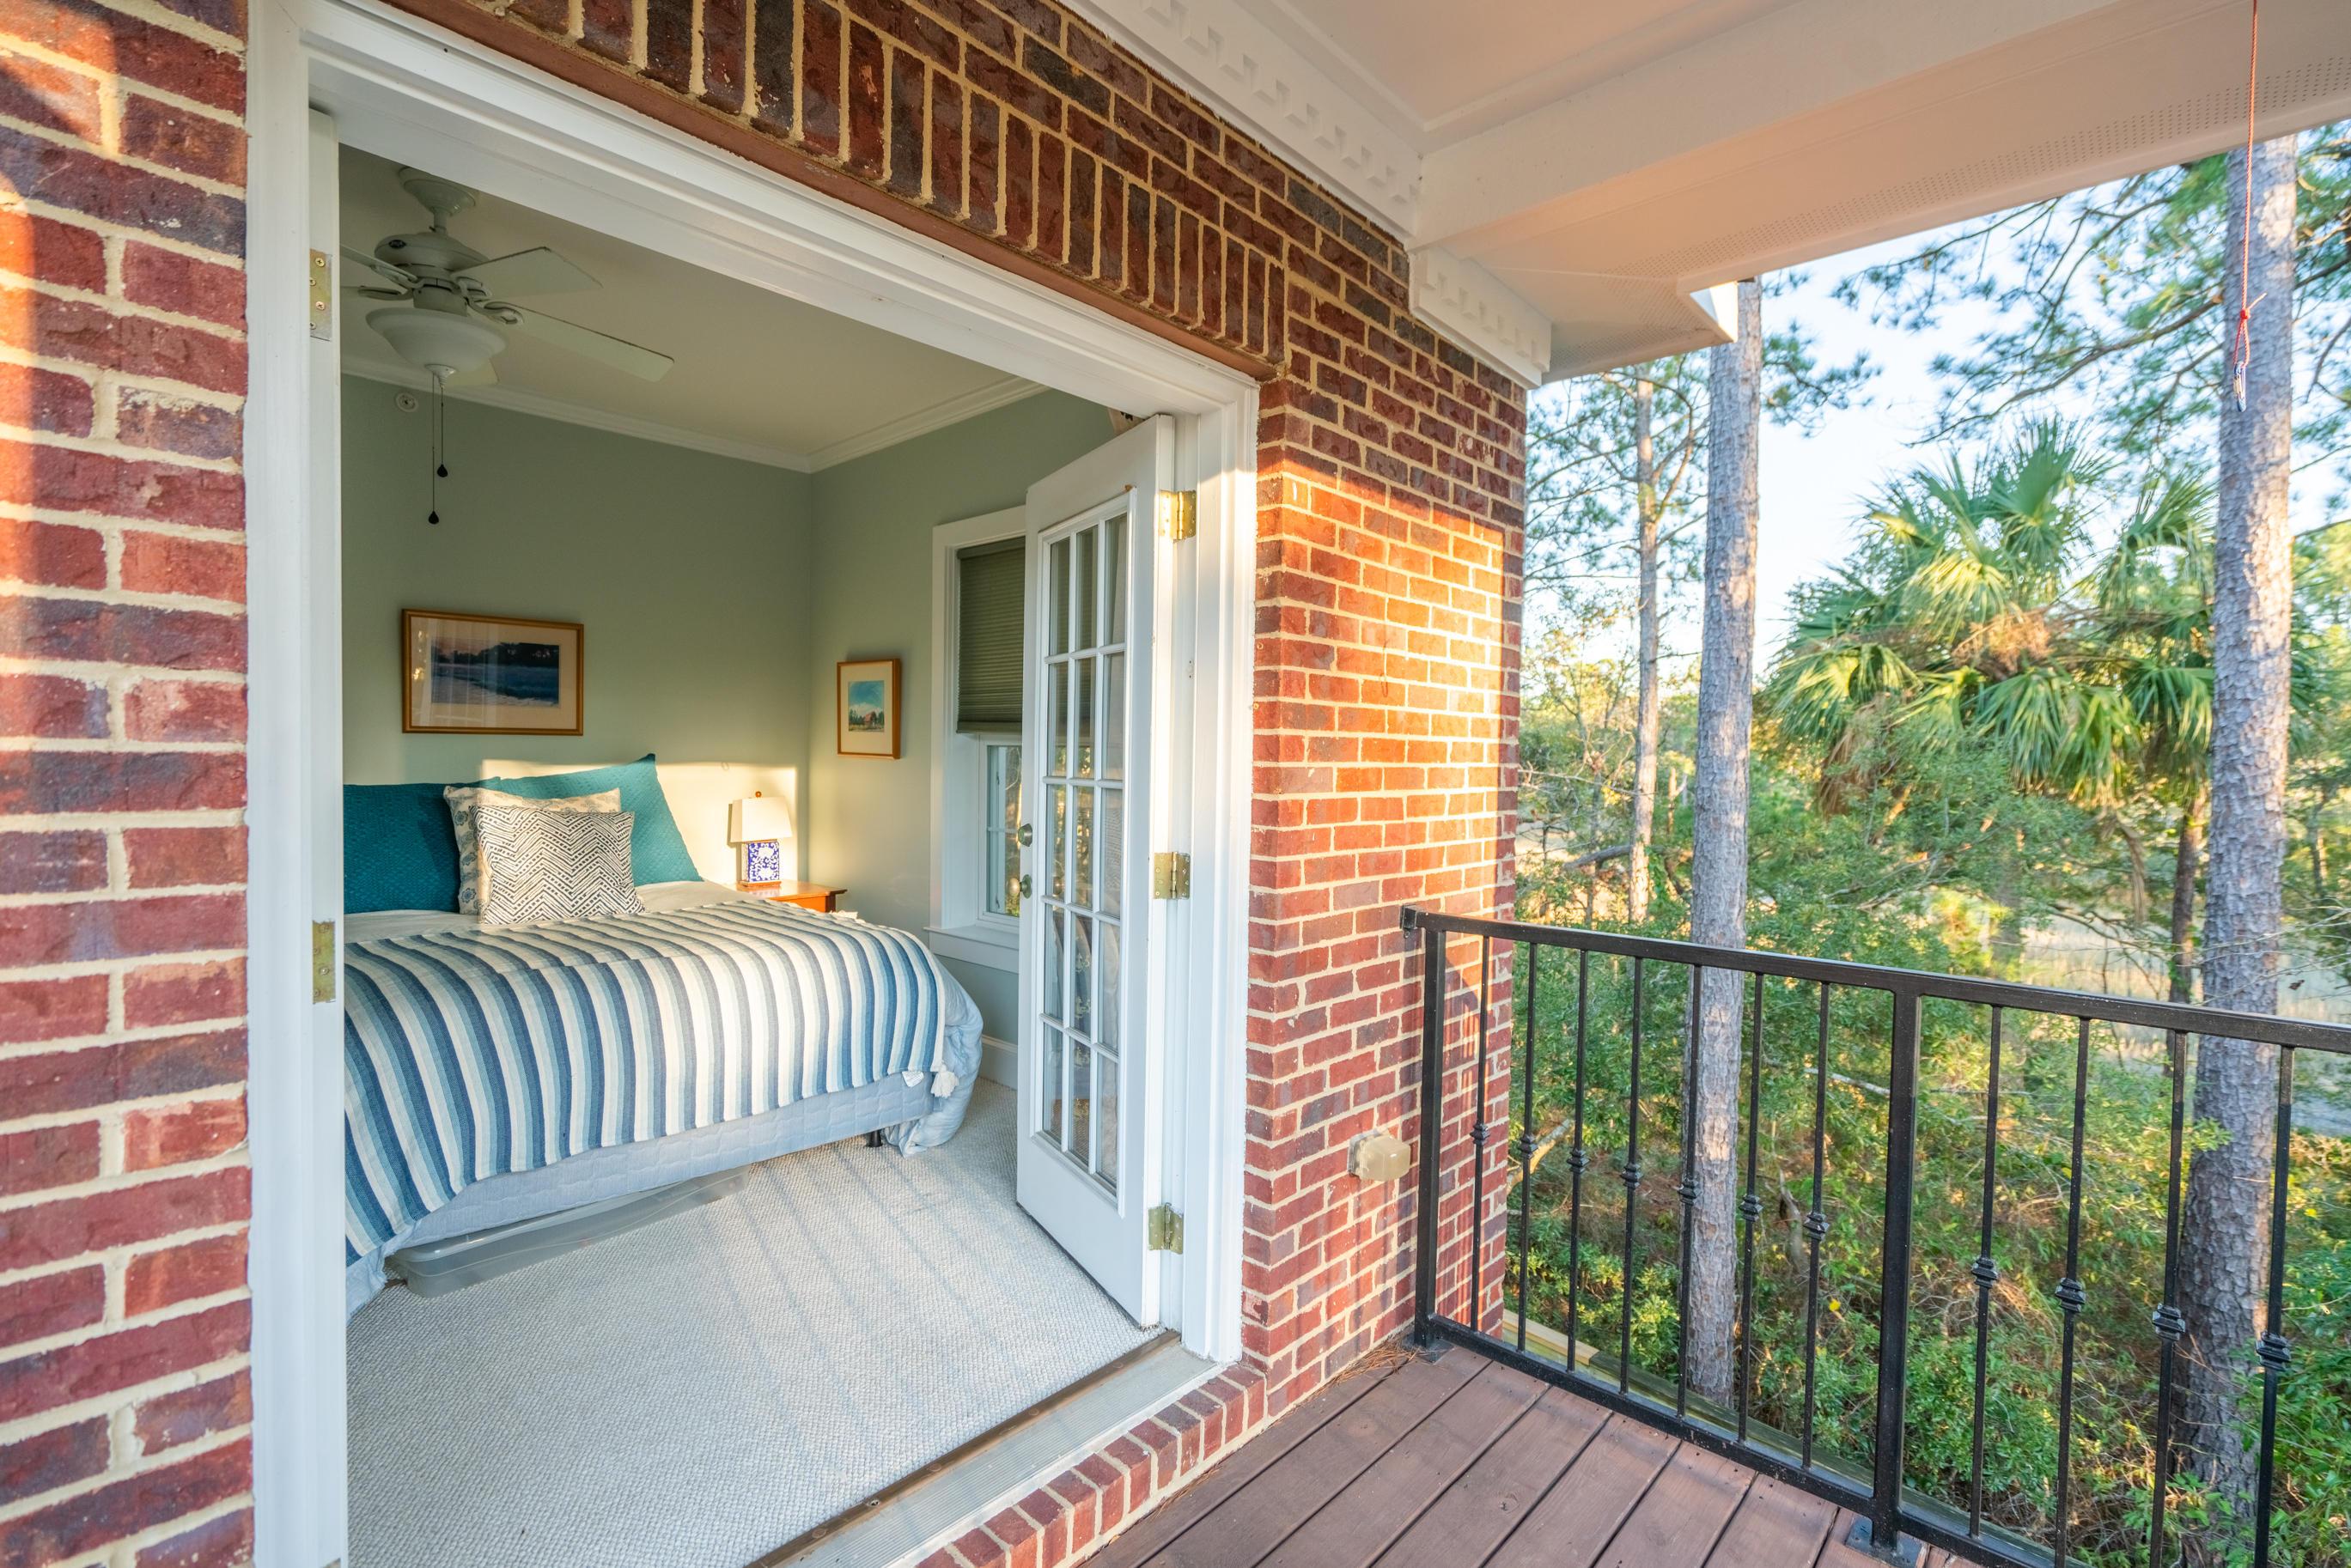 Etiwan Pointe Homes For Sale - 132 Winding Creek, Mount Pleasant, SC - 39